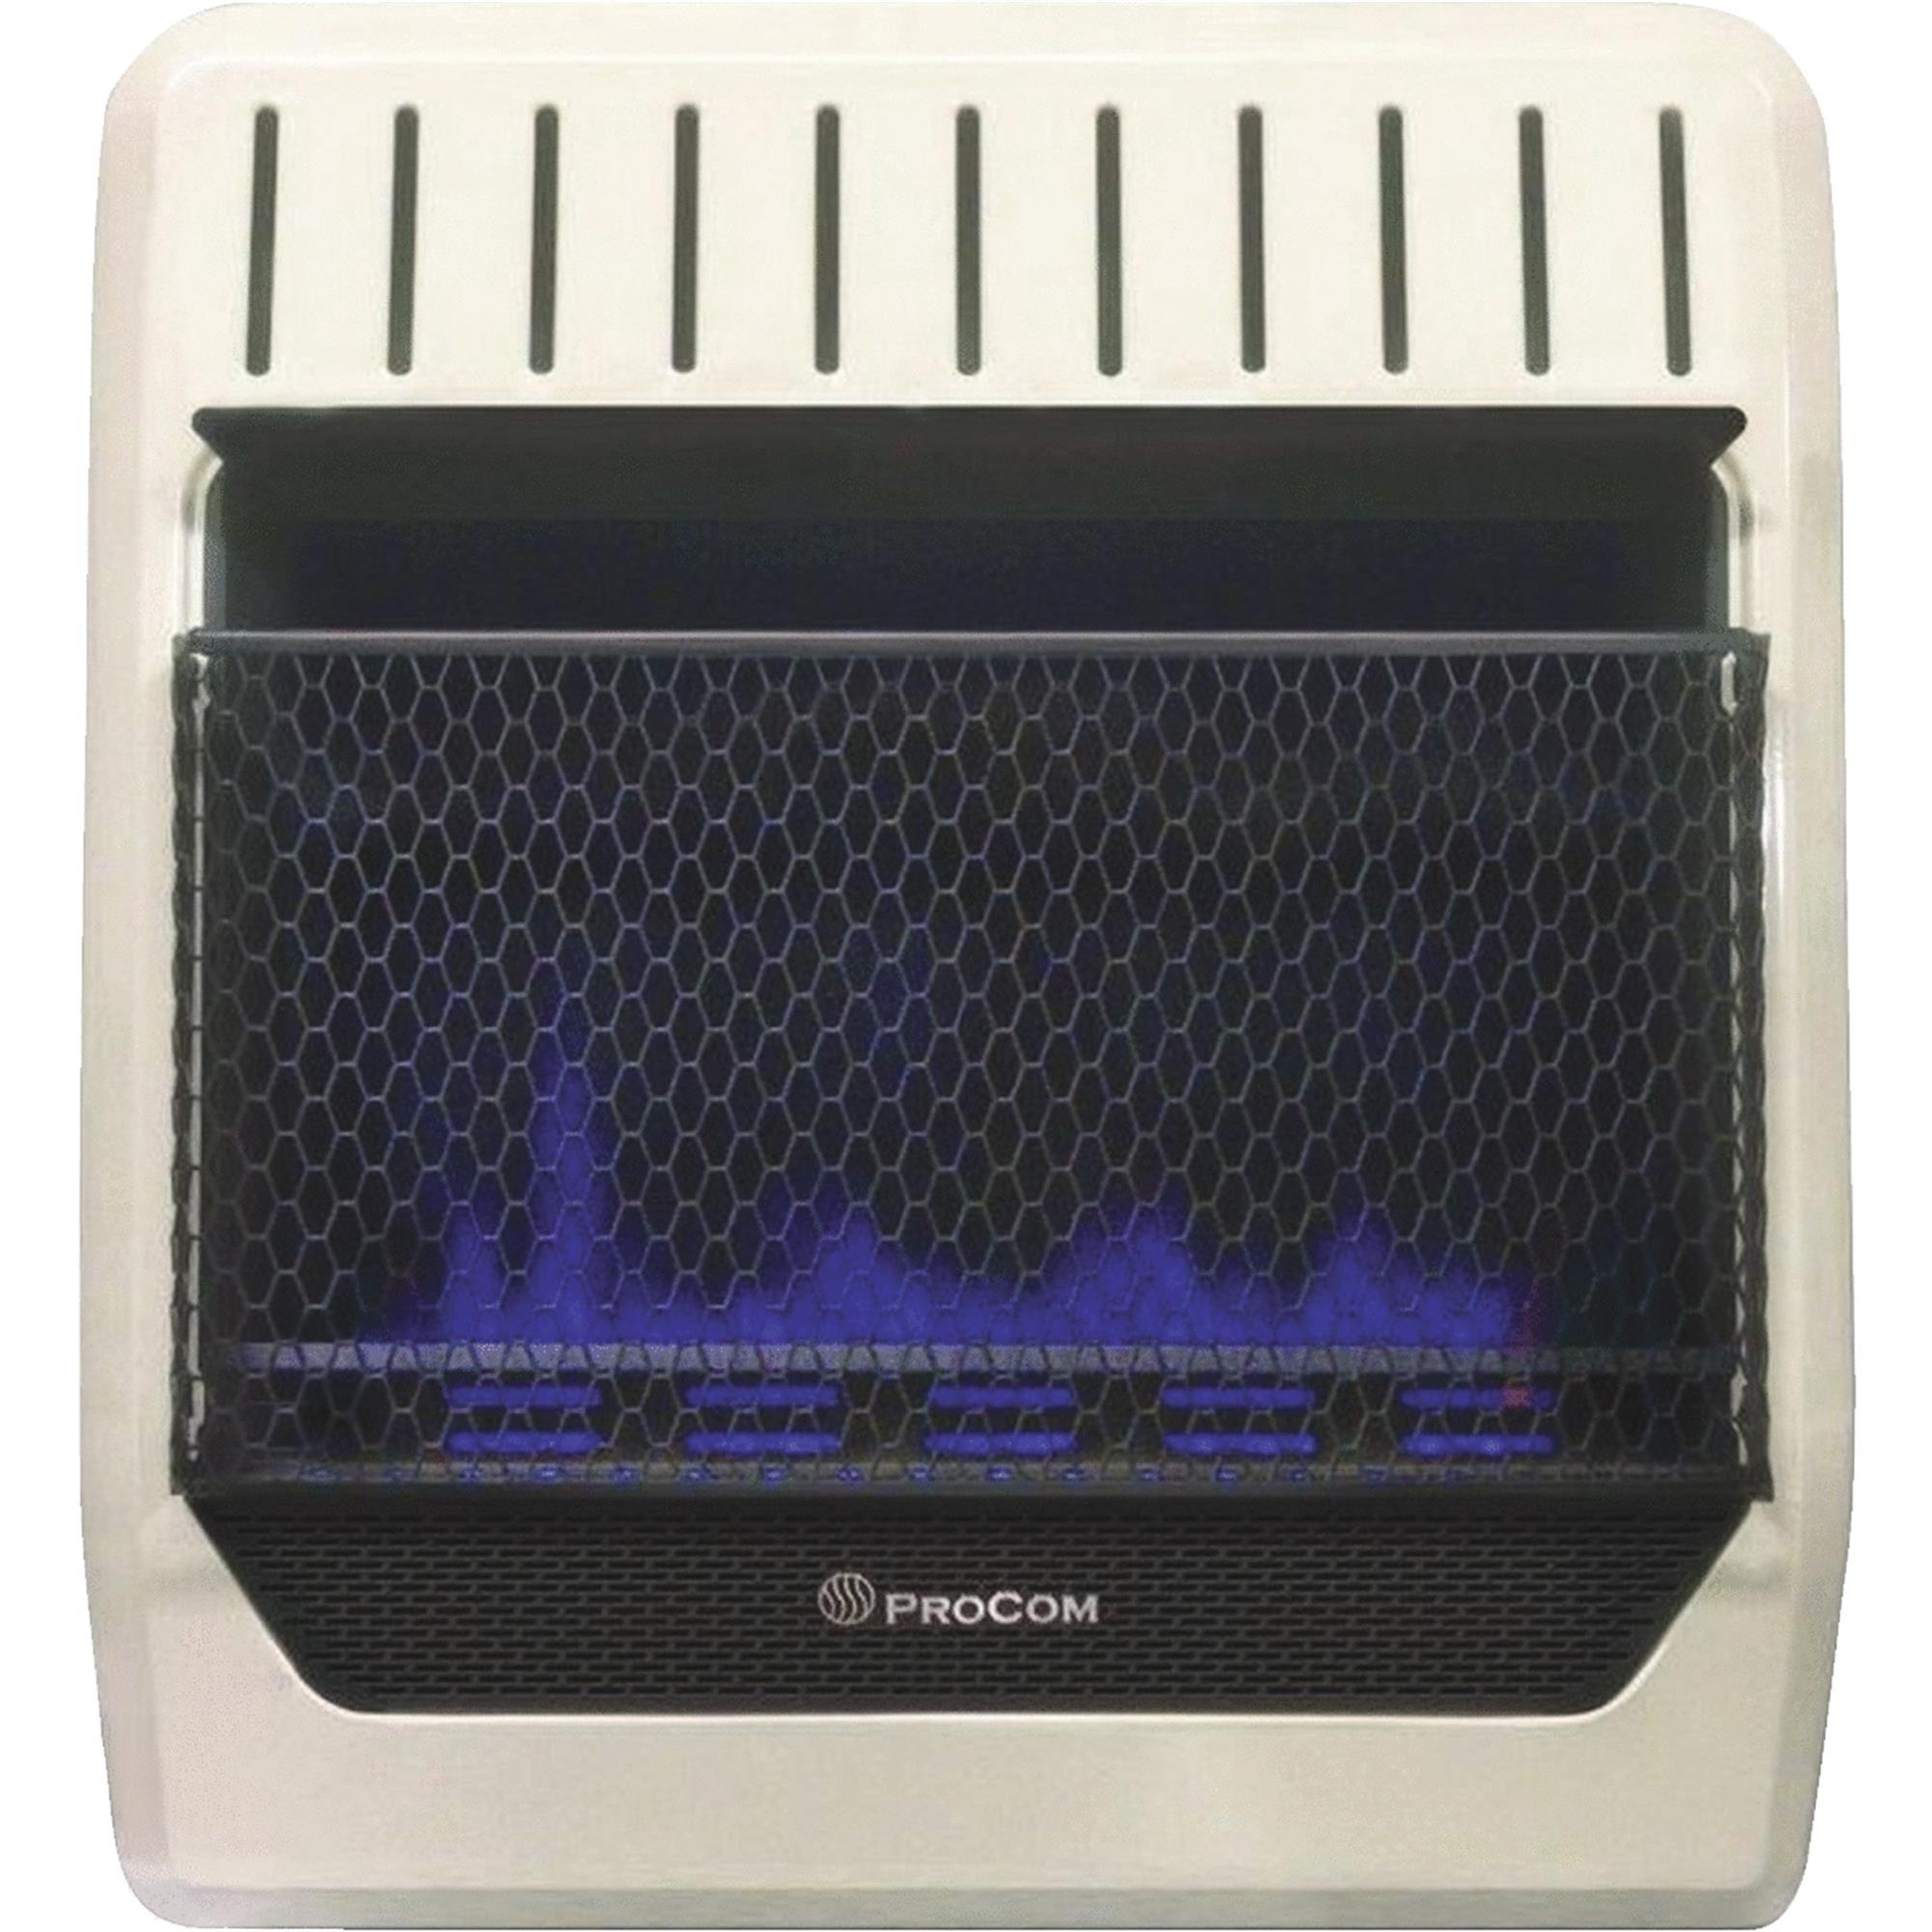 ProCom Dual Fuel Blue Flame Wall Heater by PROCOM HEATING, INC